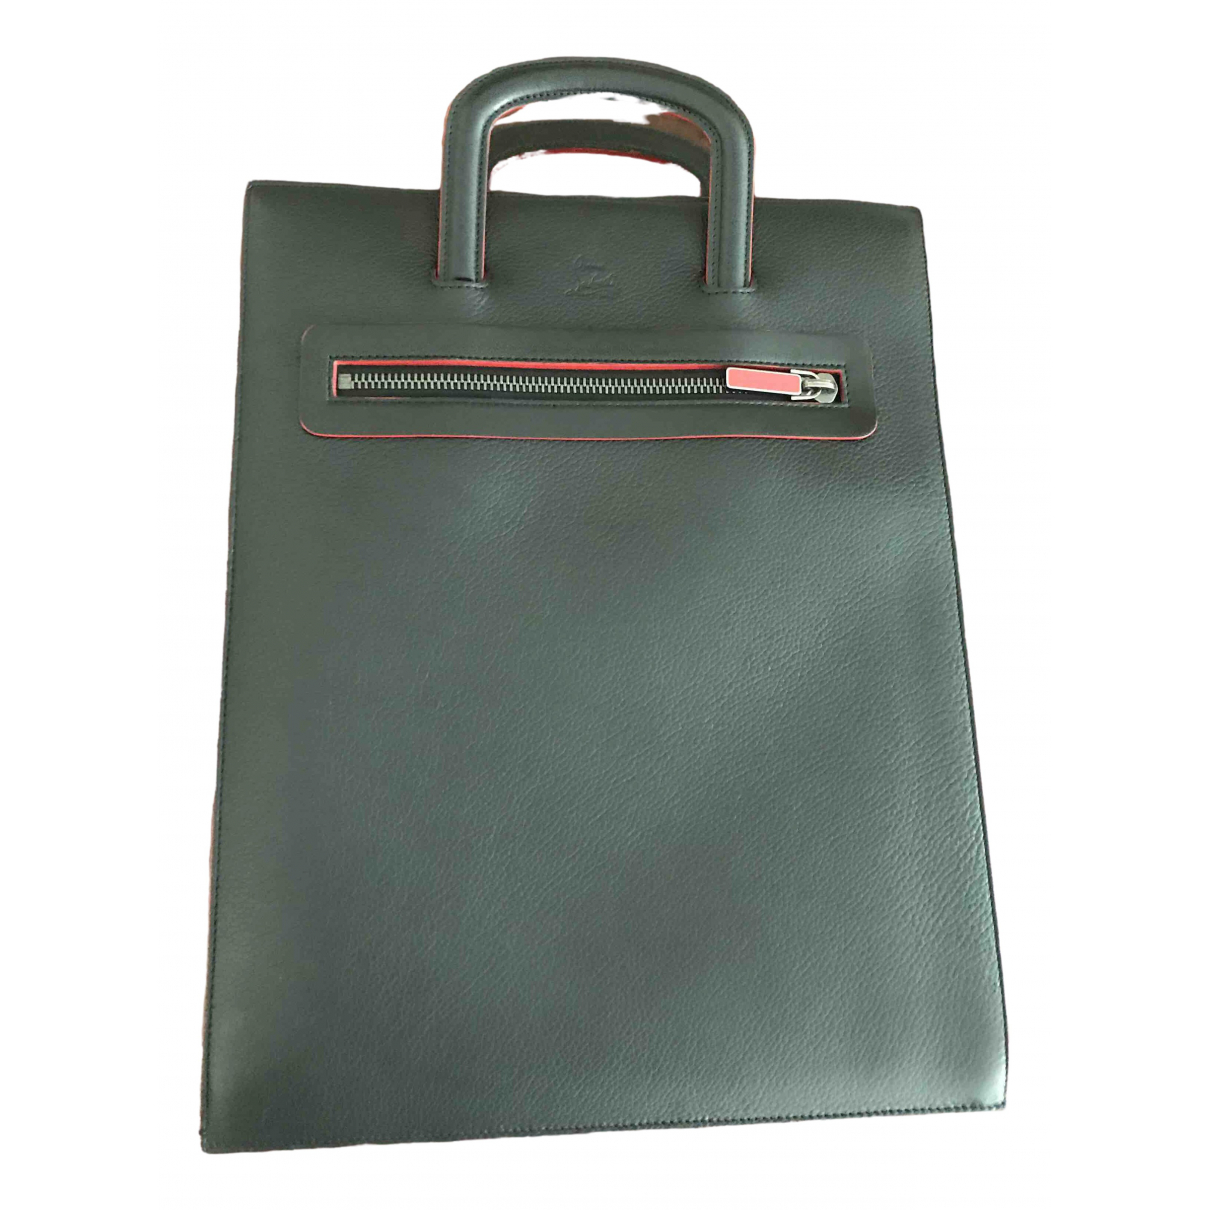 Christian Louboutin \N Black Leather bag for Men \N